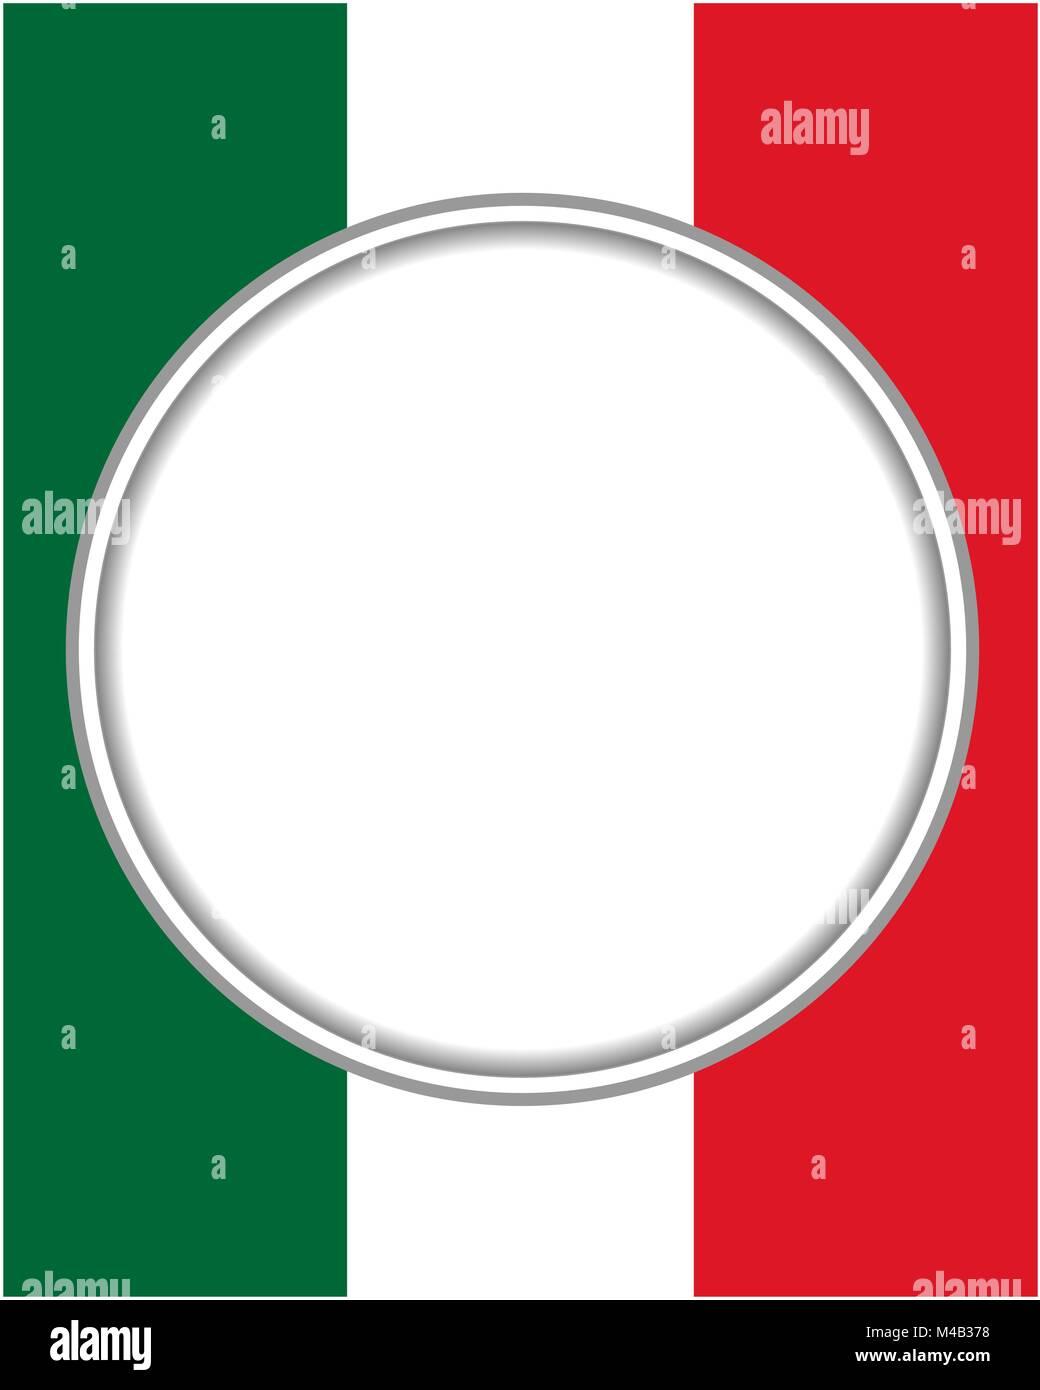 Italy Flag Frame Stockfotos & Italy Flag Frame Bilder - Alamy